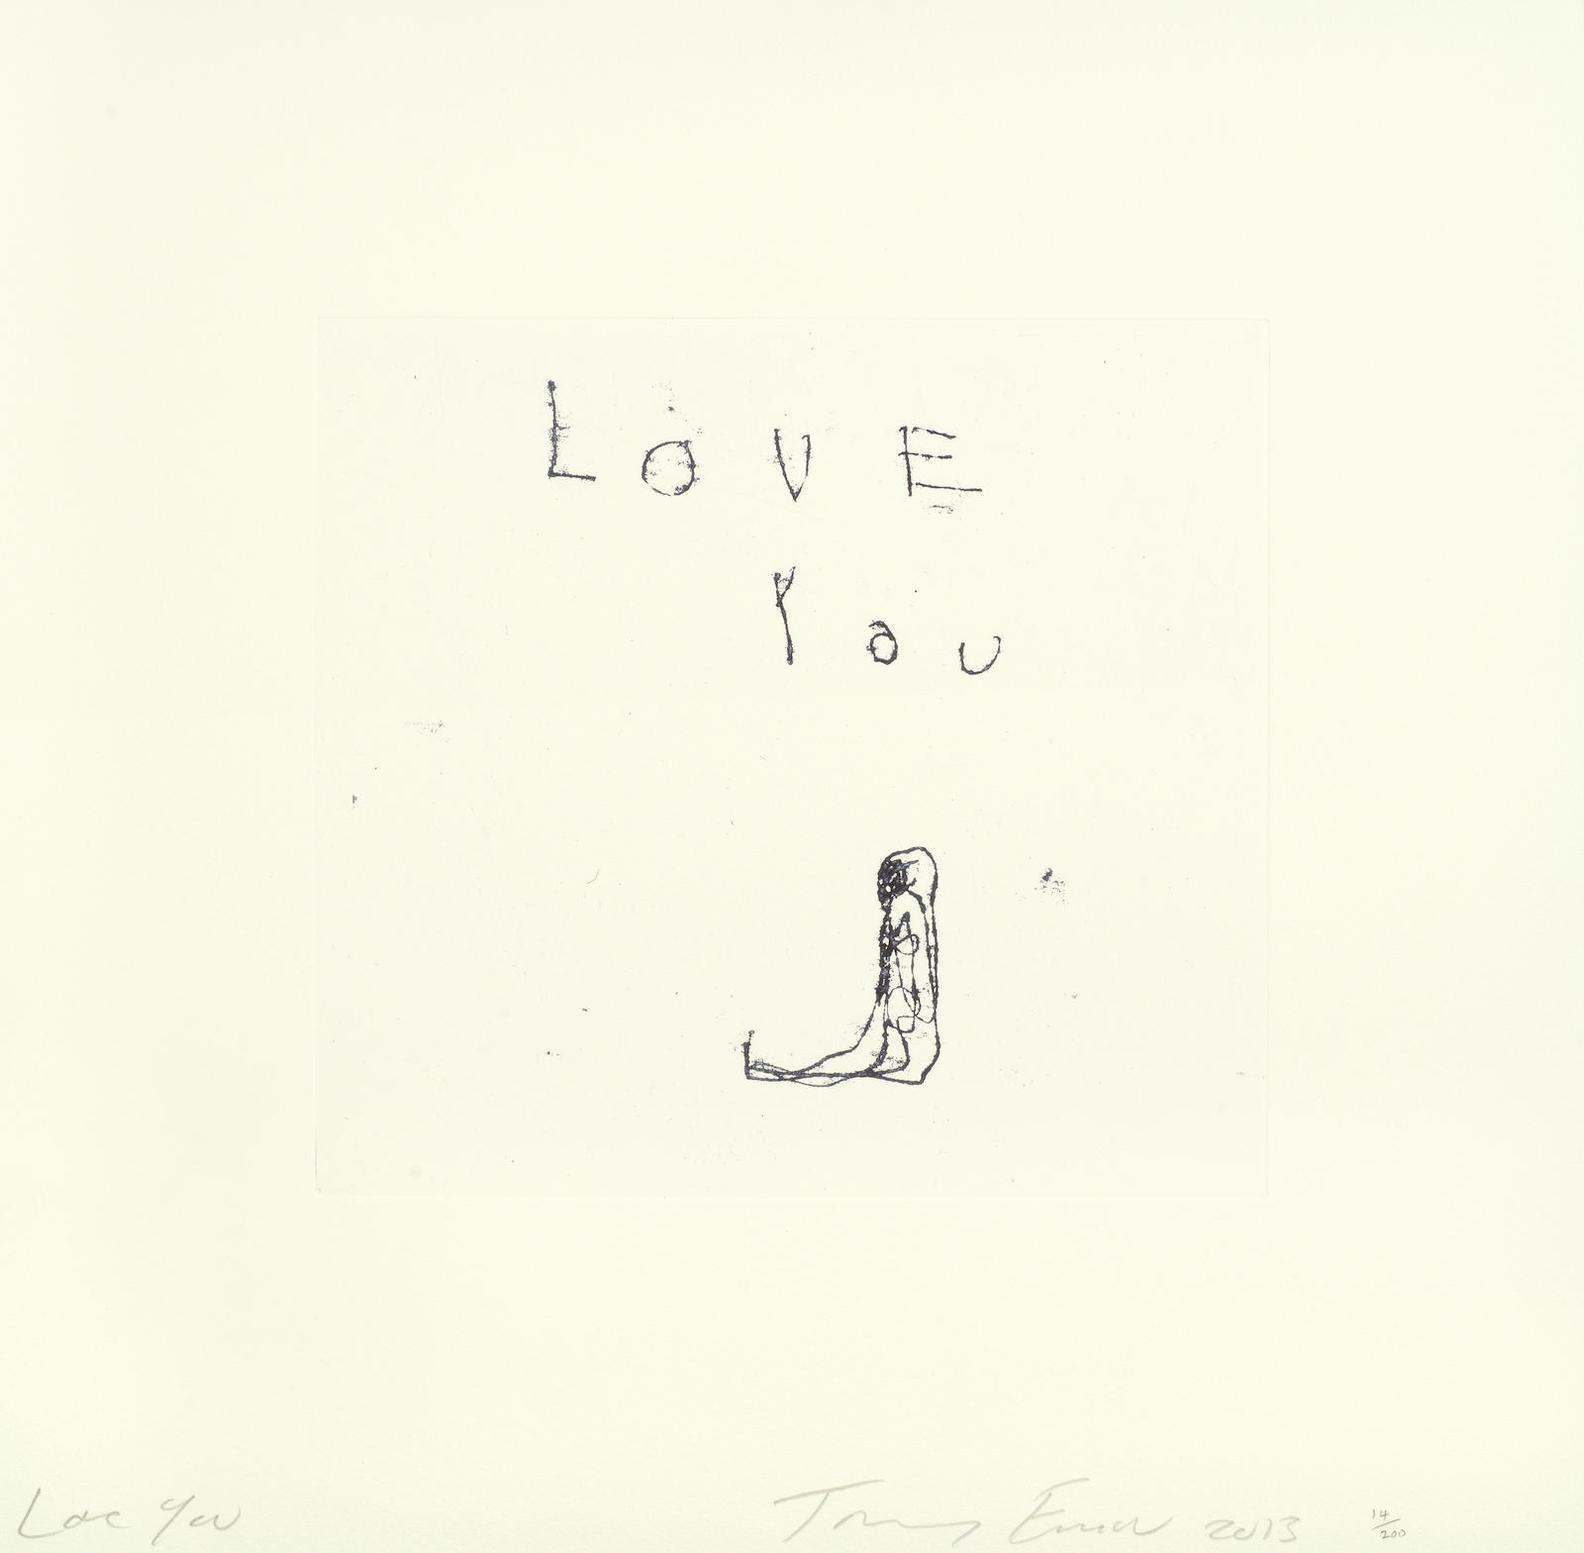 Tracey Emin-Love You-2013